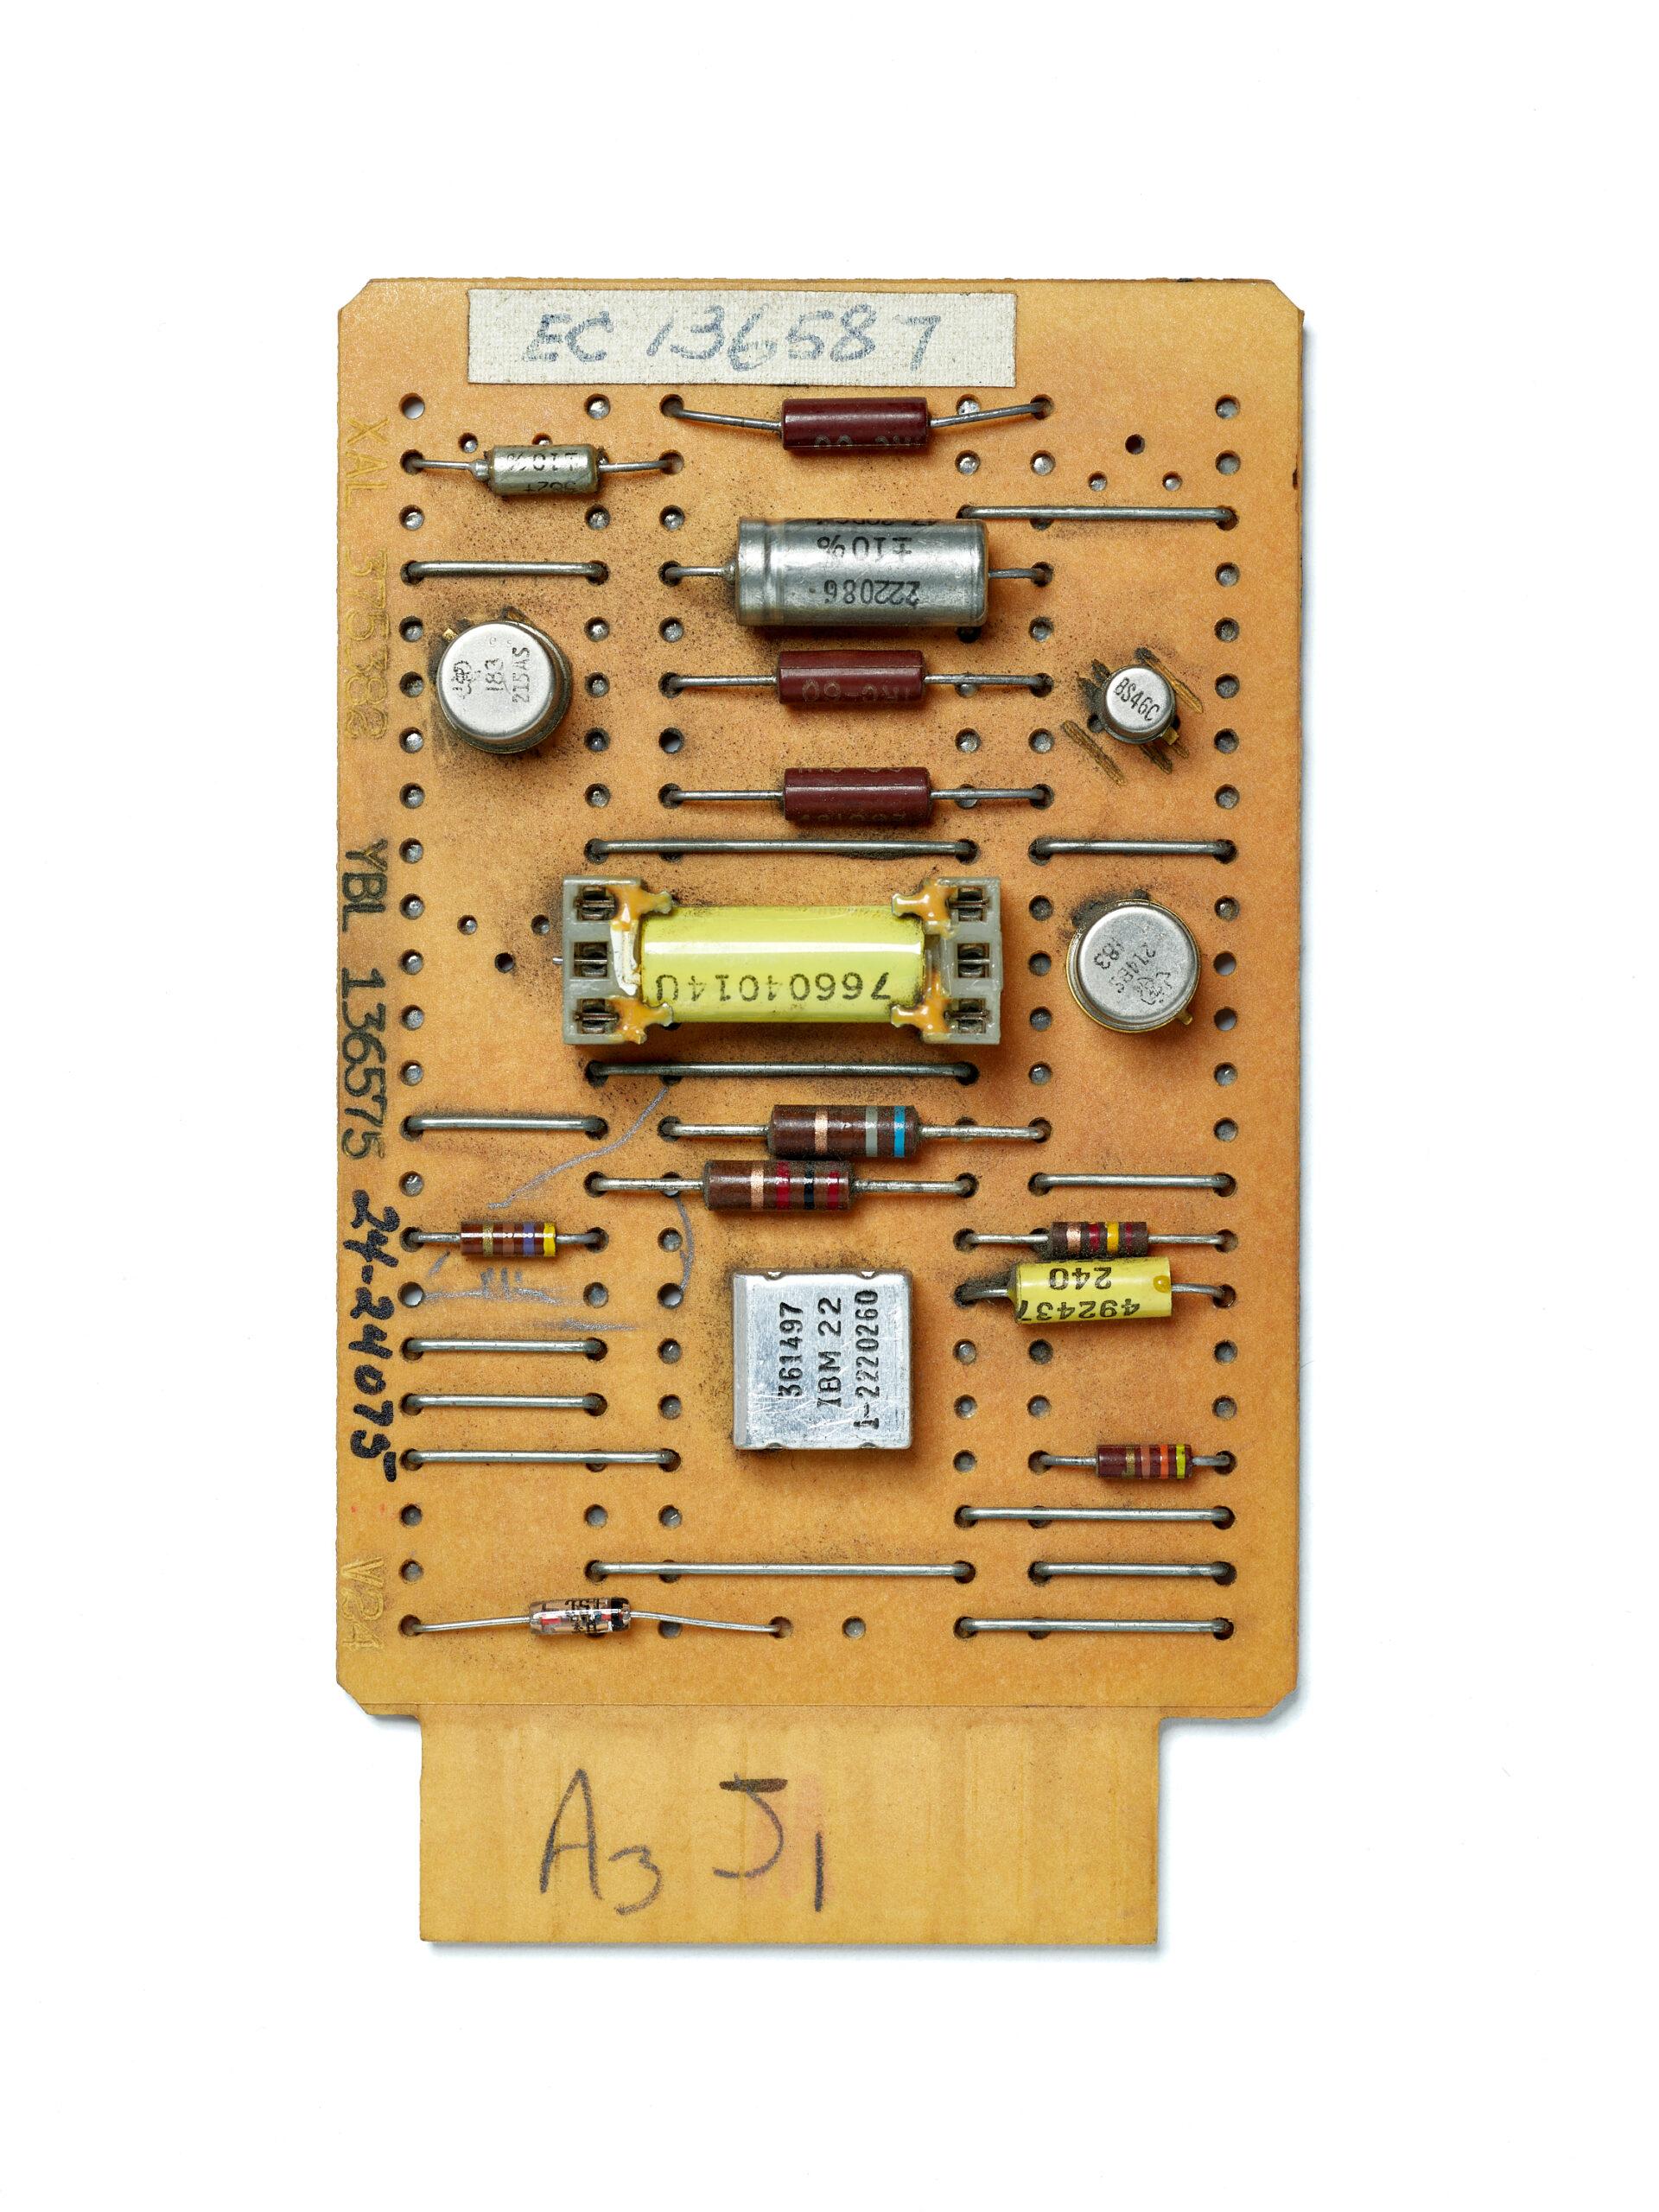 IBM SMS Card XAL. SMS Card, circuit board, computer, mainframe, tech history, transistors, vintage computing.